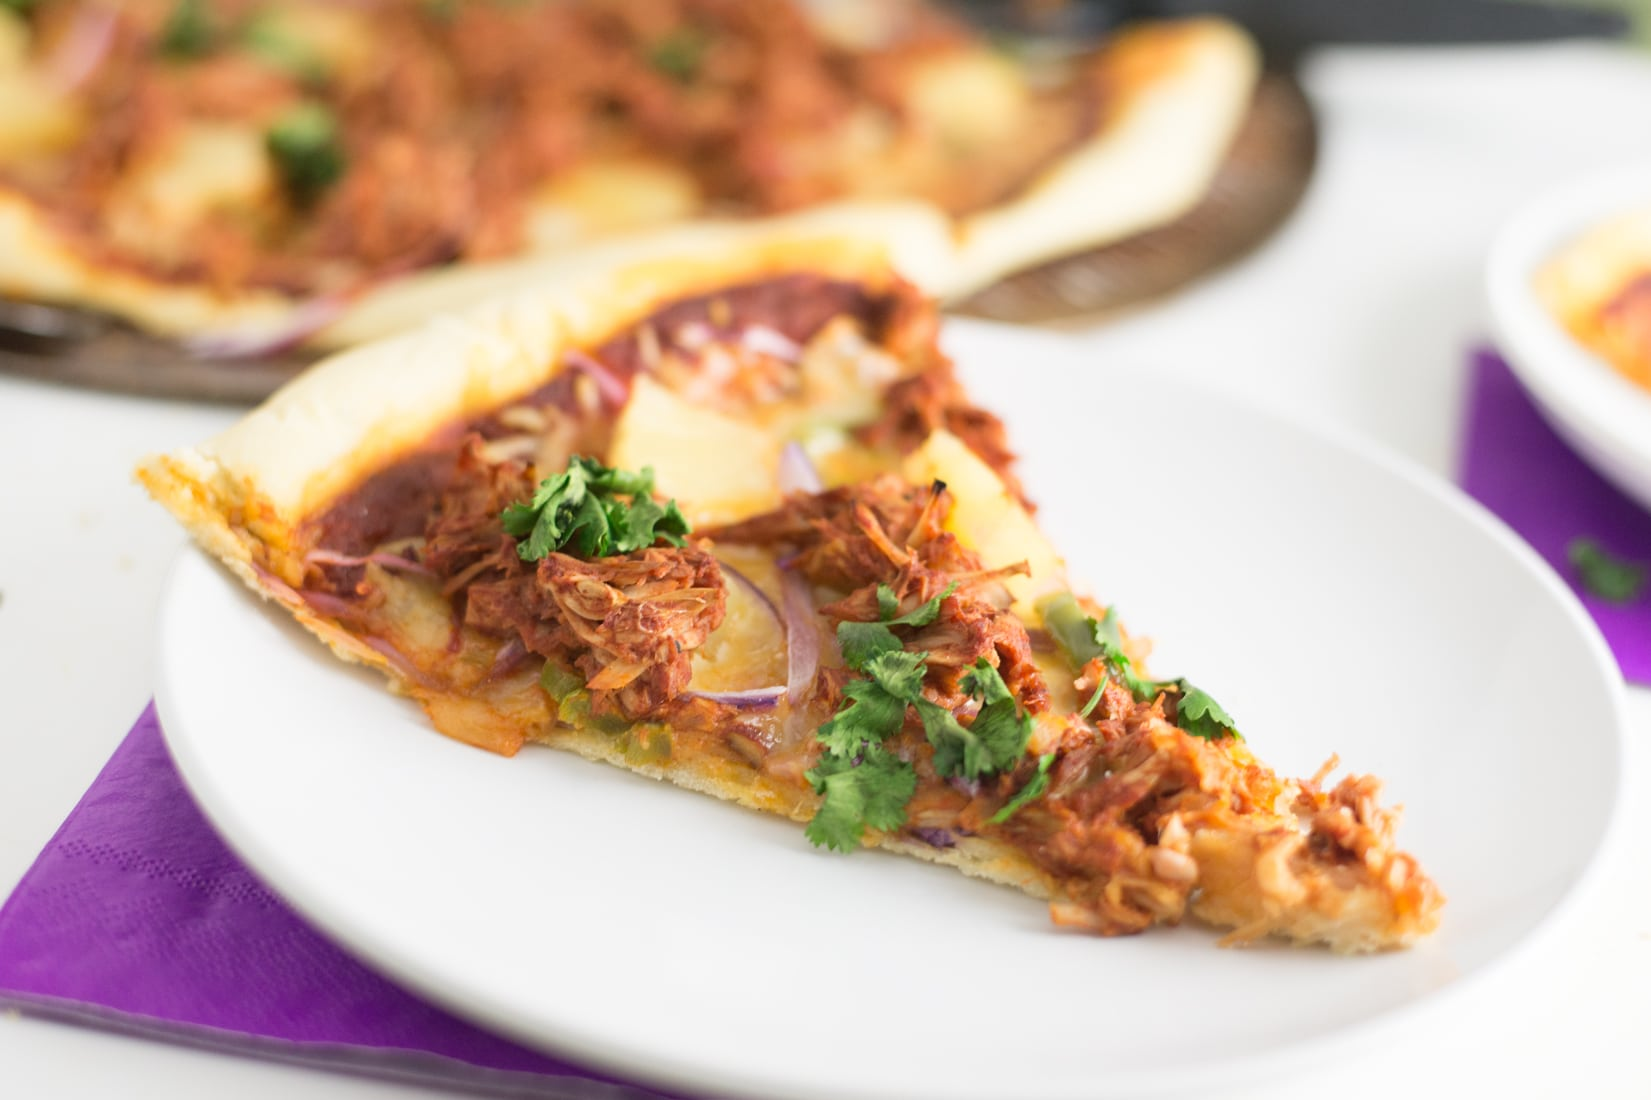 jackfruit pulled pork pizza slice on white plate